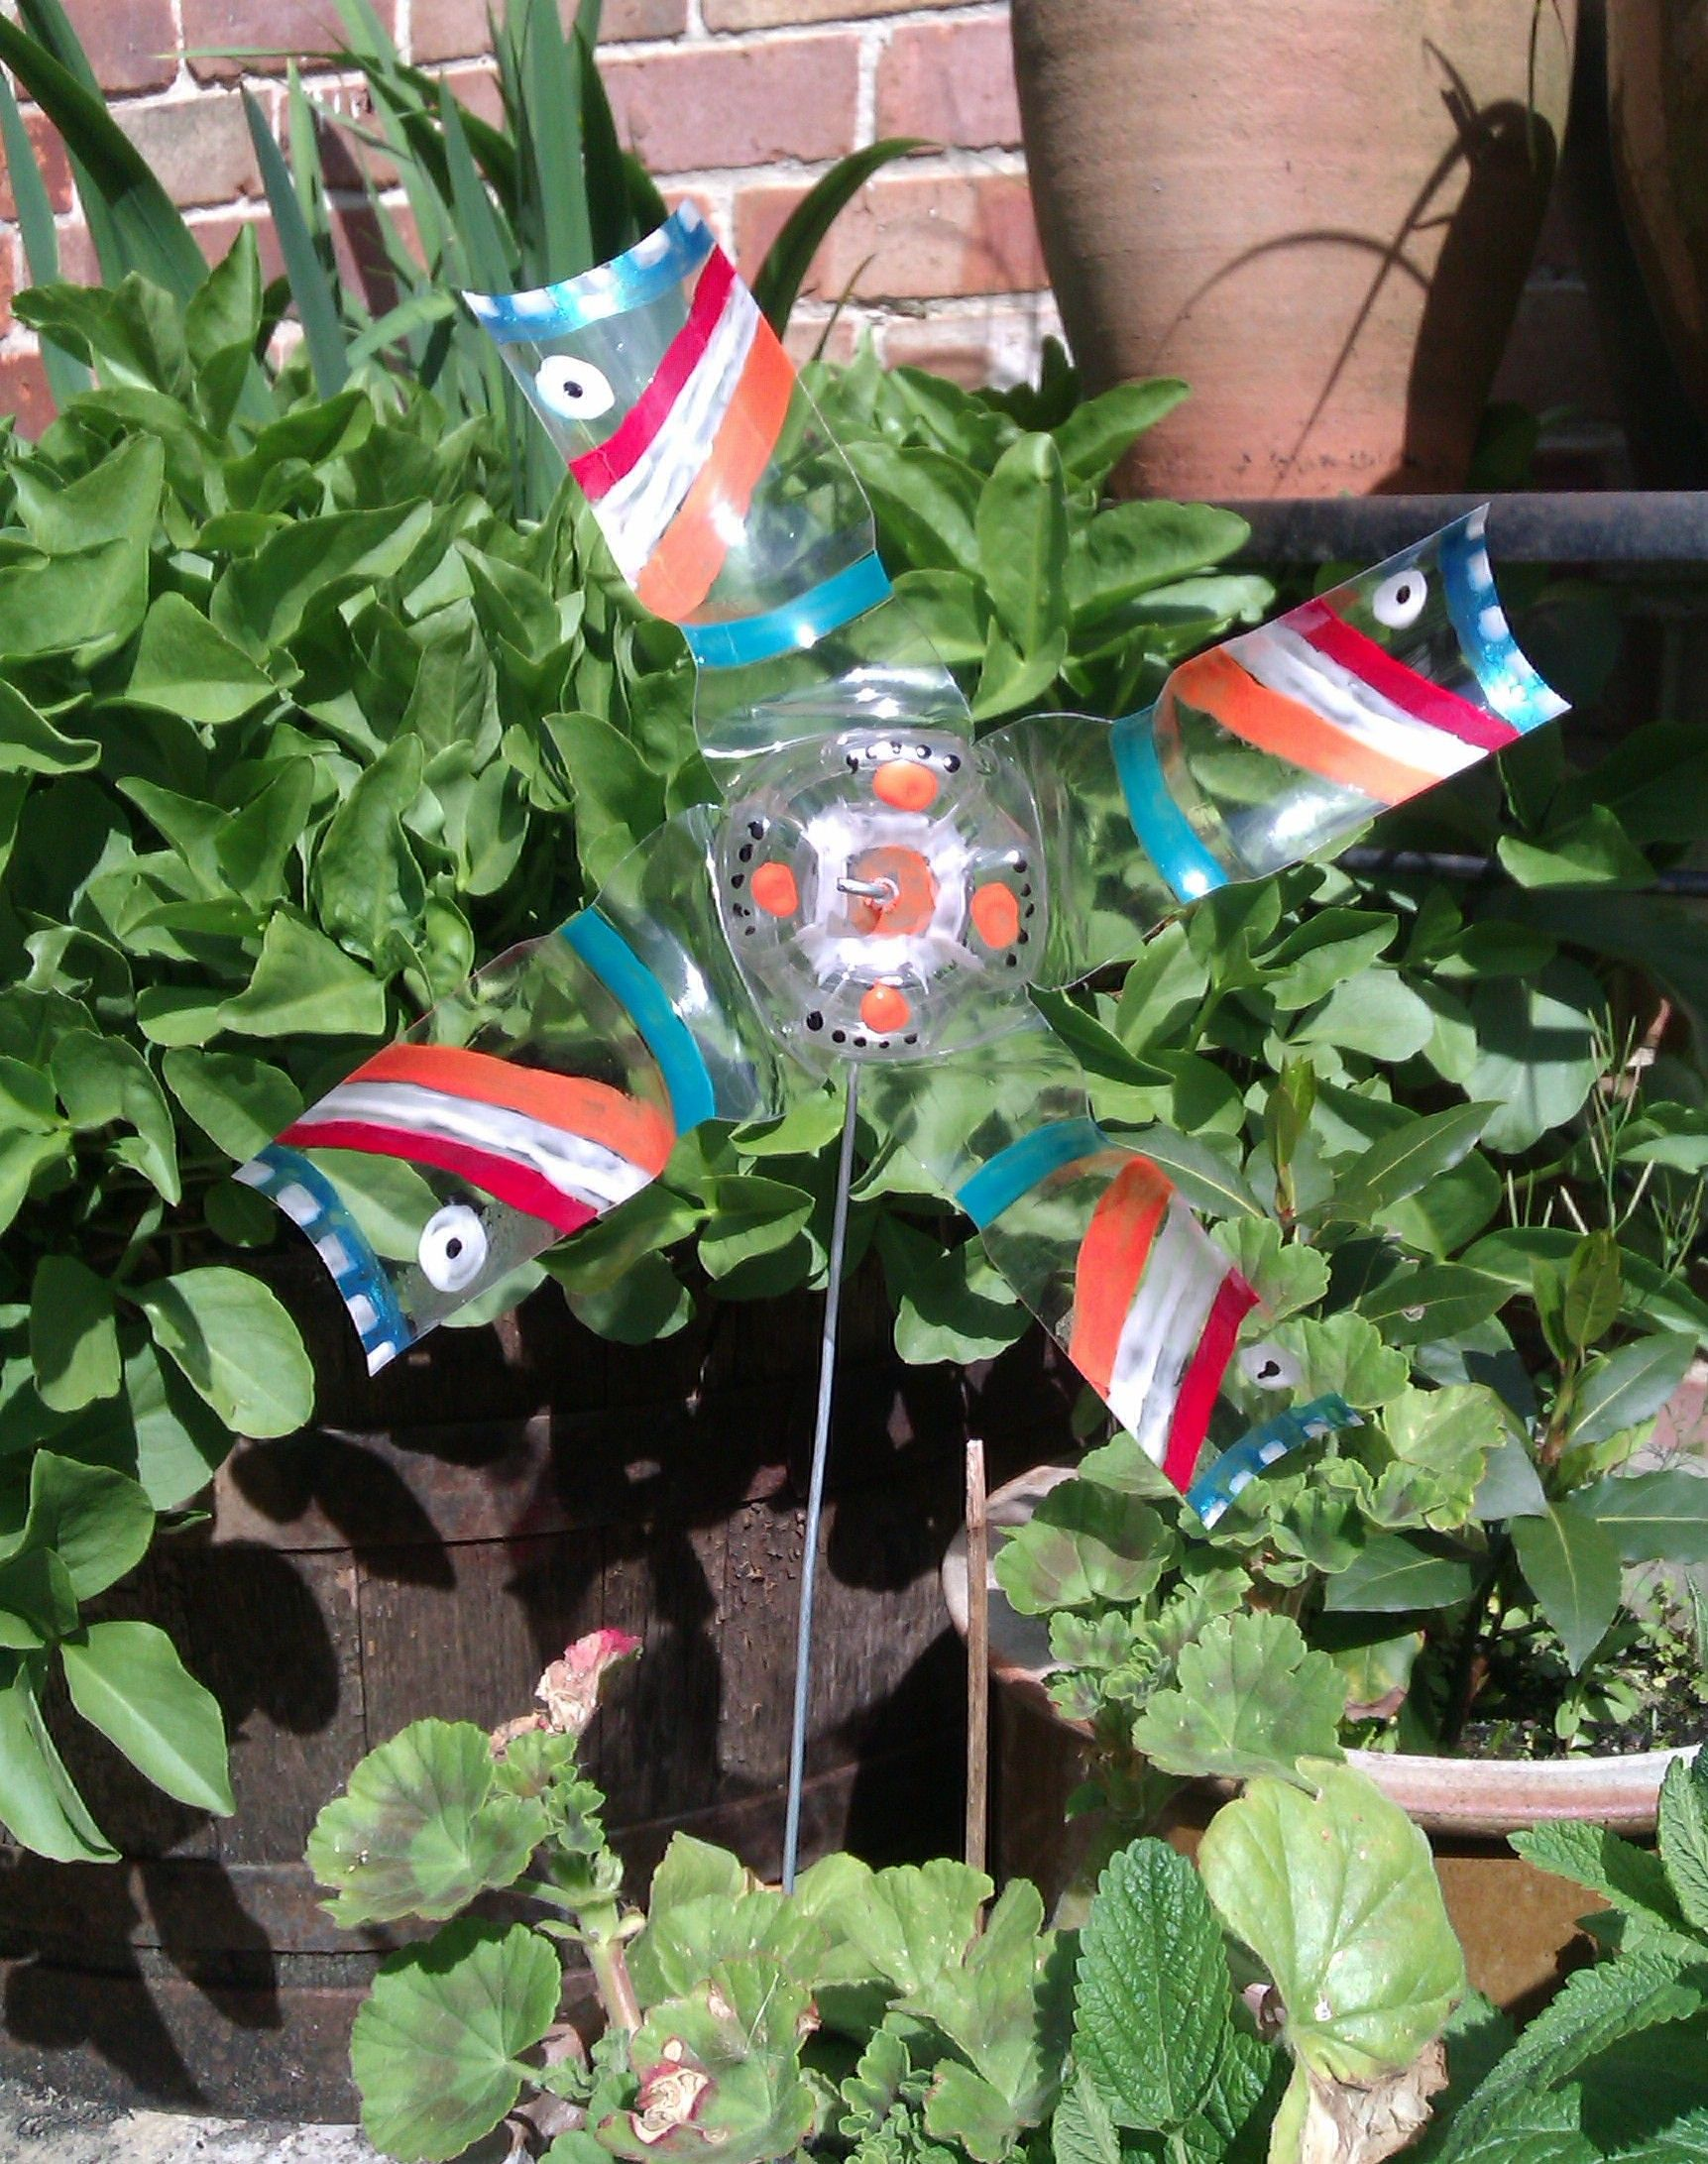 DIY garden windmill from a plastic bottle | Windmill, Plastic ...